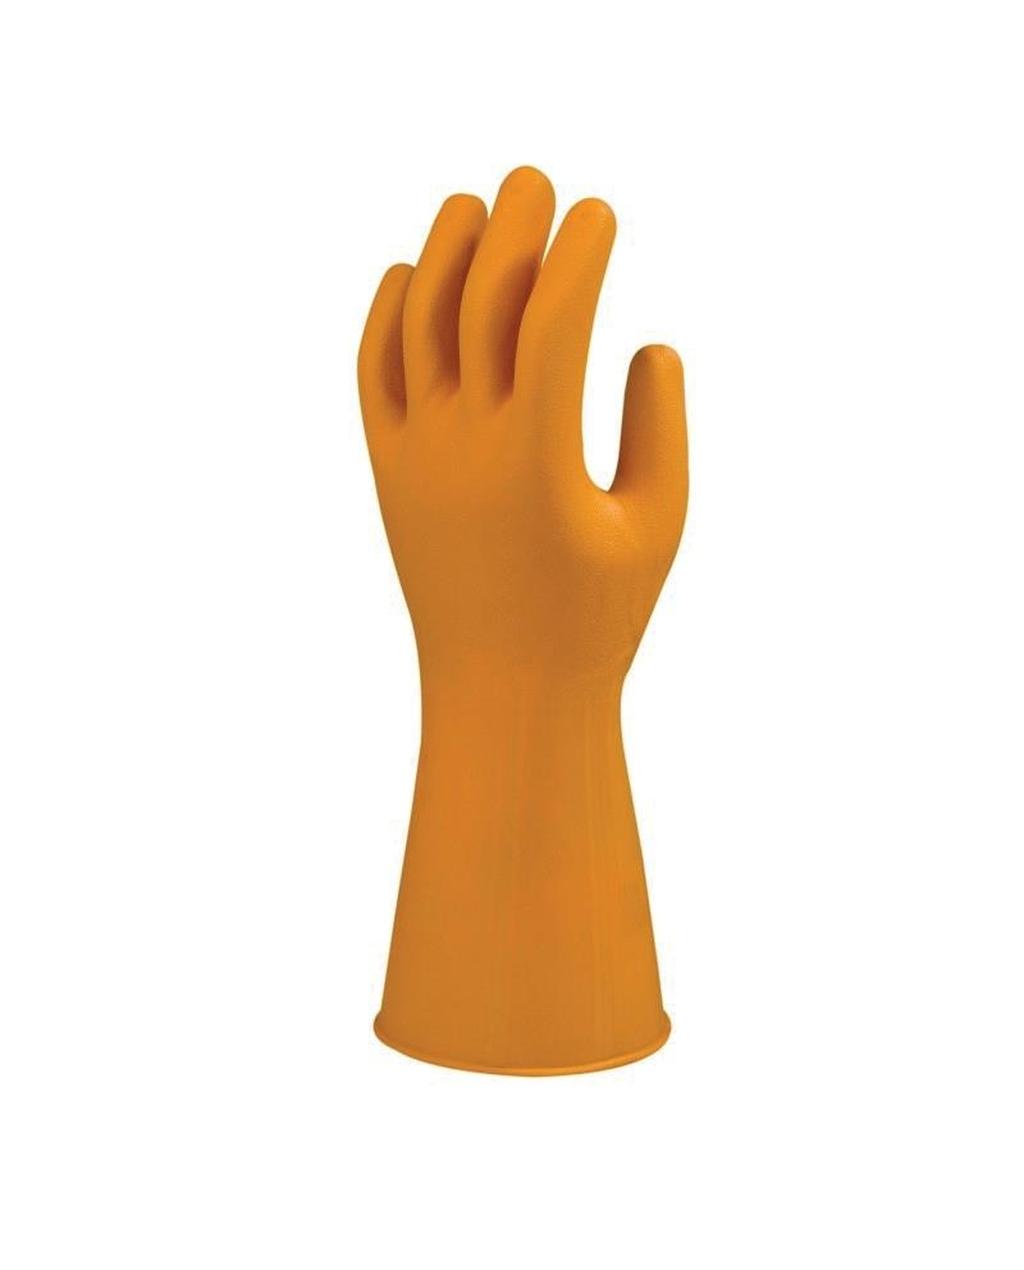 Heavy Duty Orange Latex Household Gloves Small